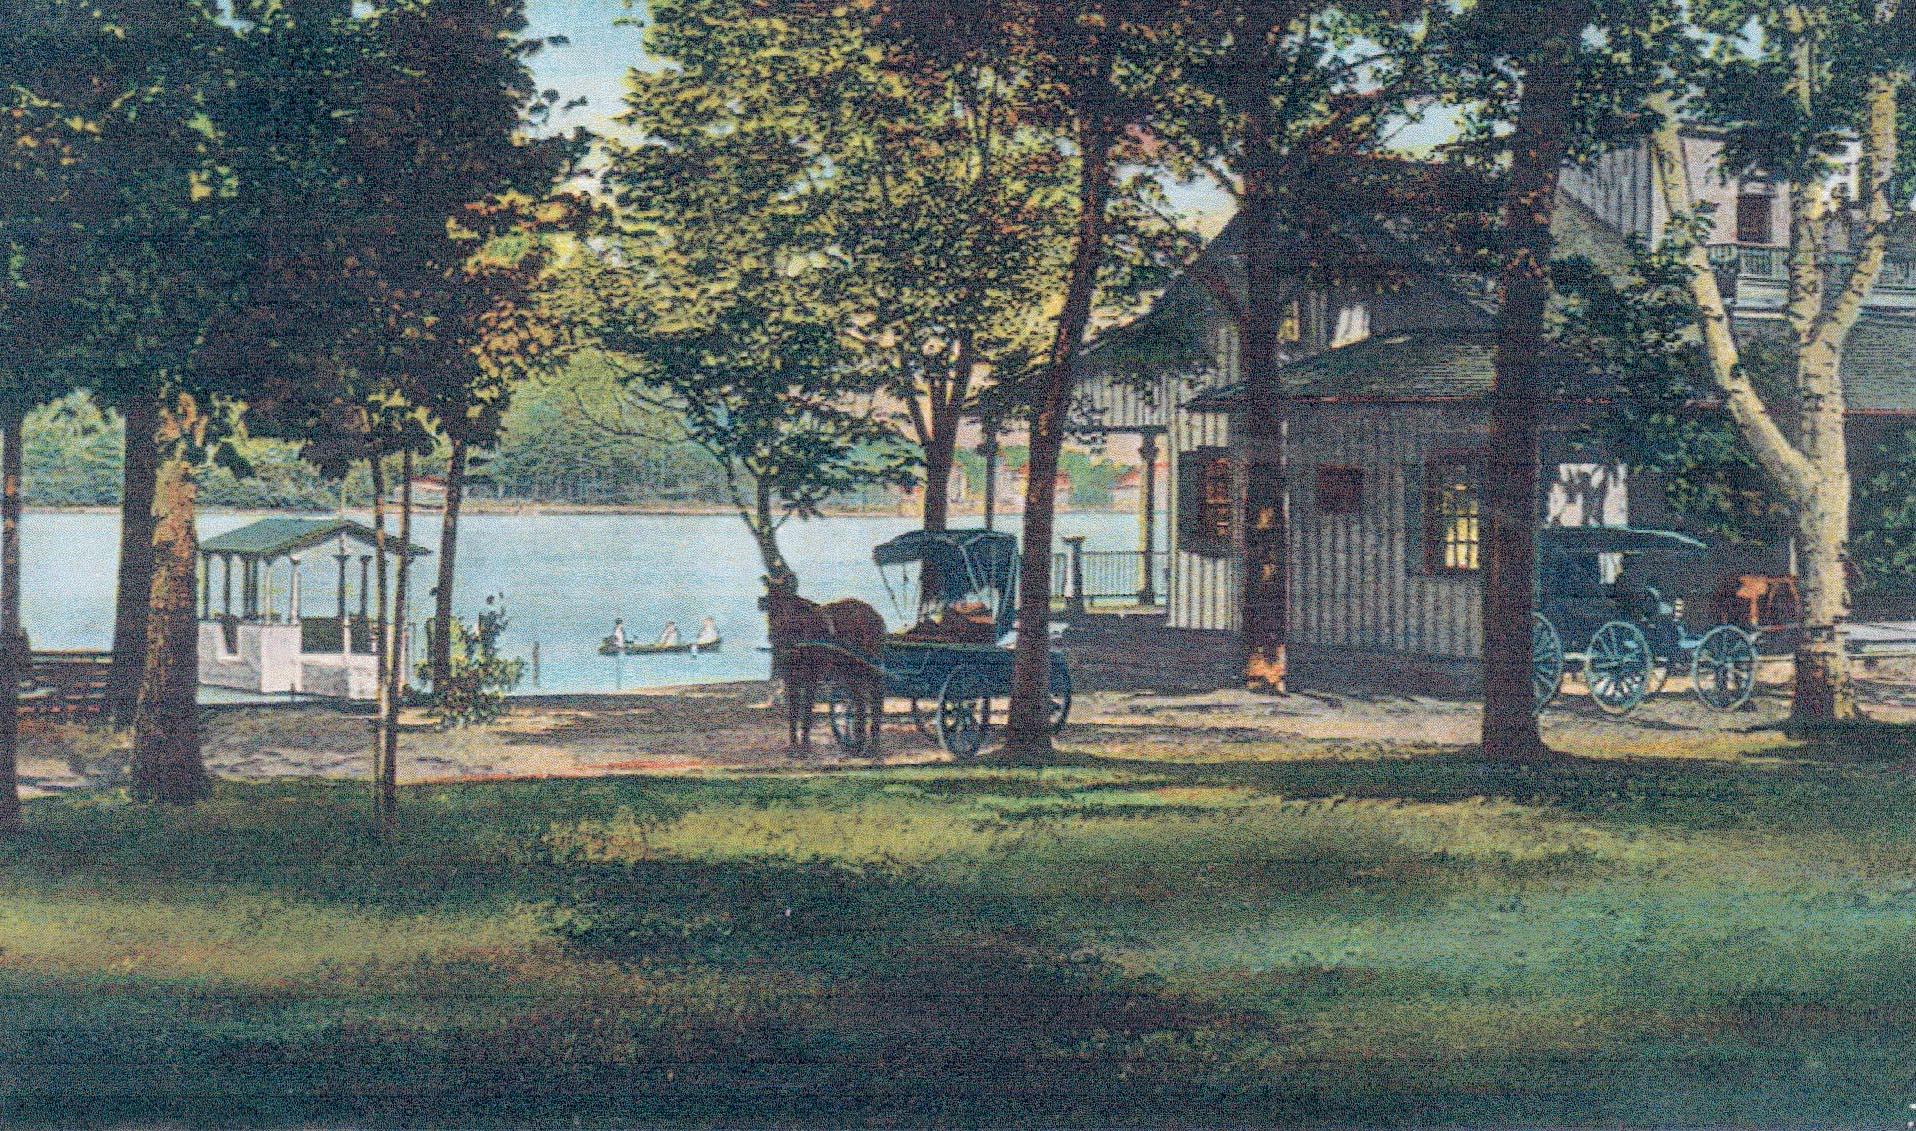 RP boathouse and horsePCcolor.jpg